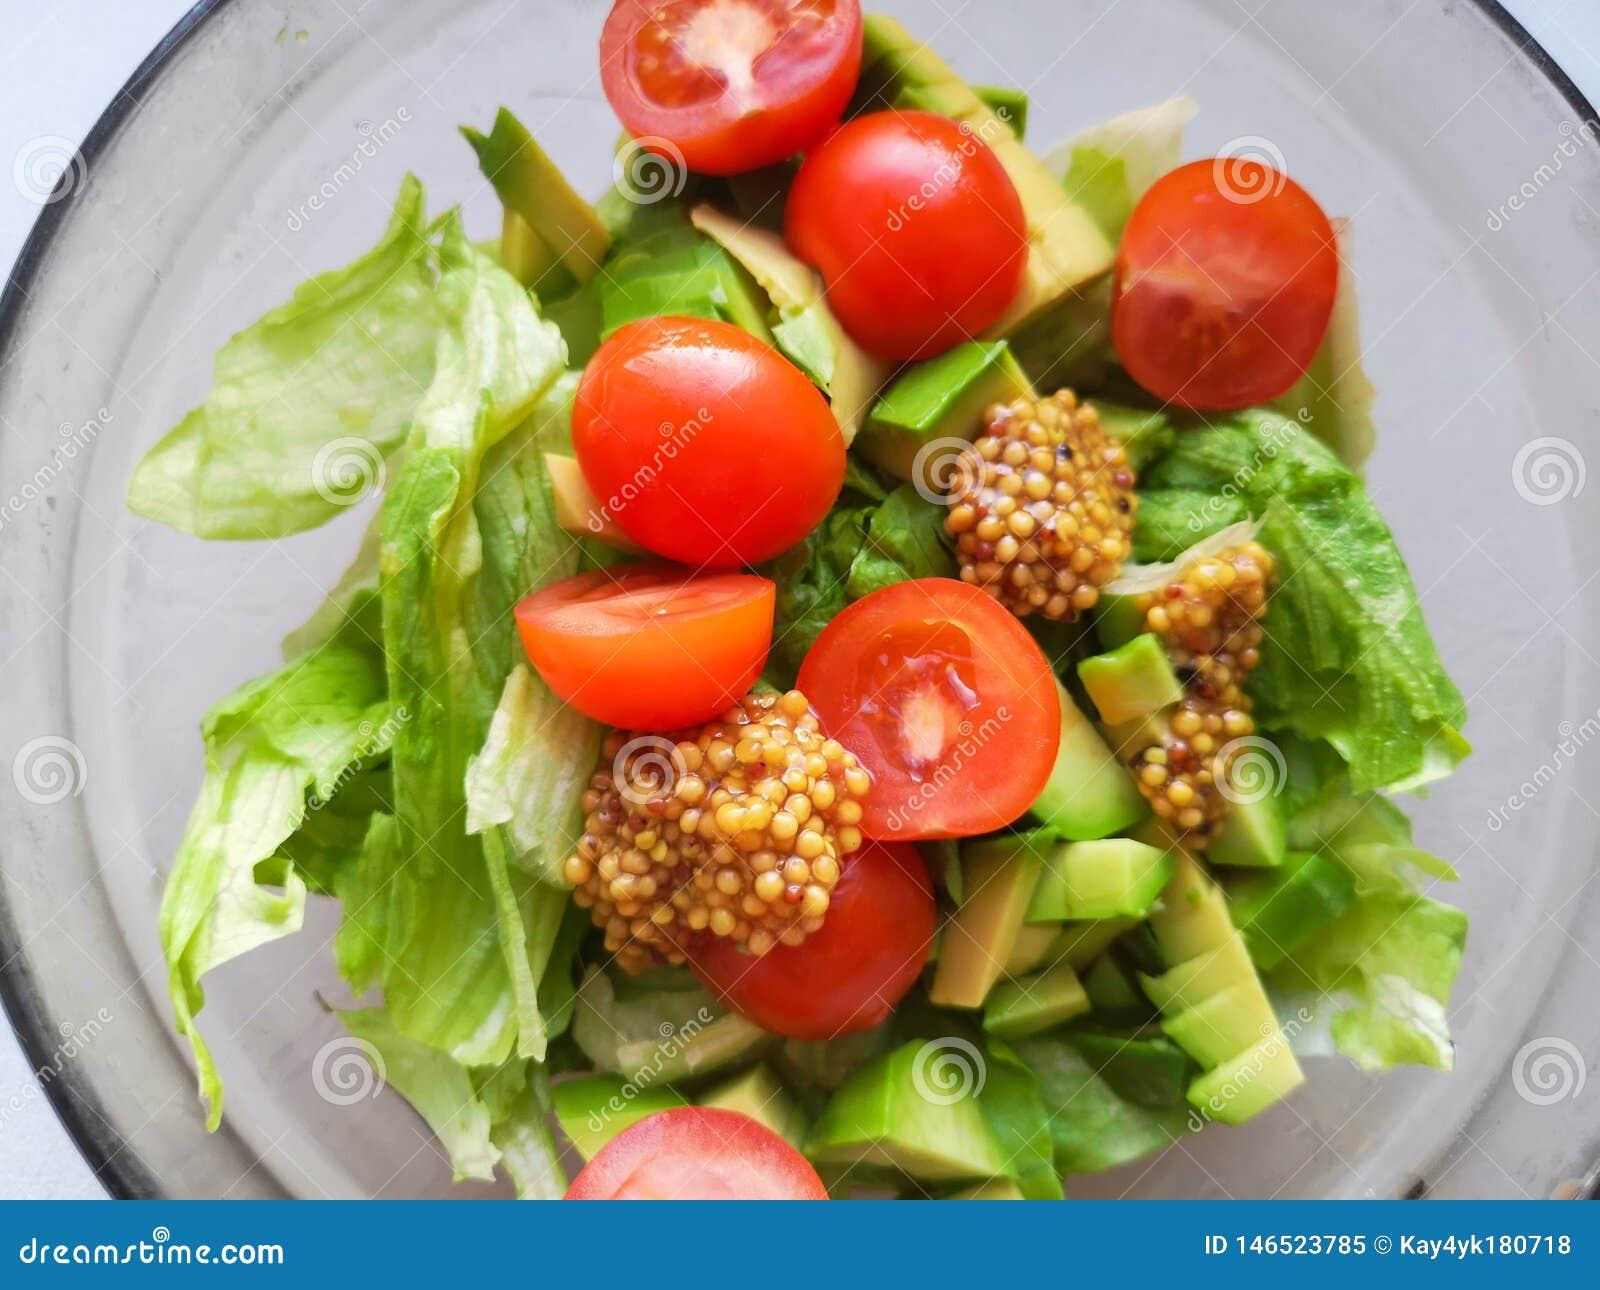 Vegetarian vegetable salad. Fresh salad flying to bowl in super slow motion. Avocado Tomato Salad